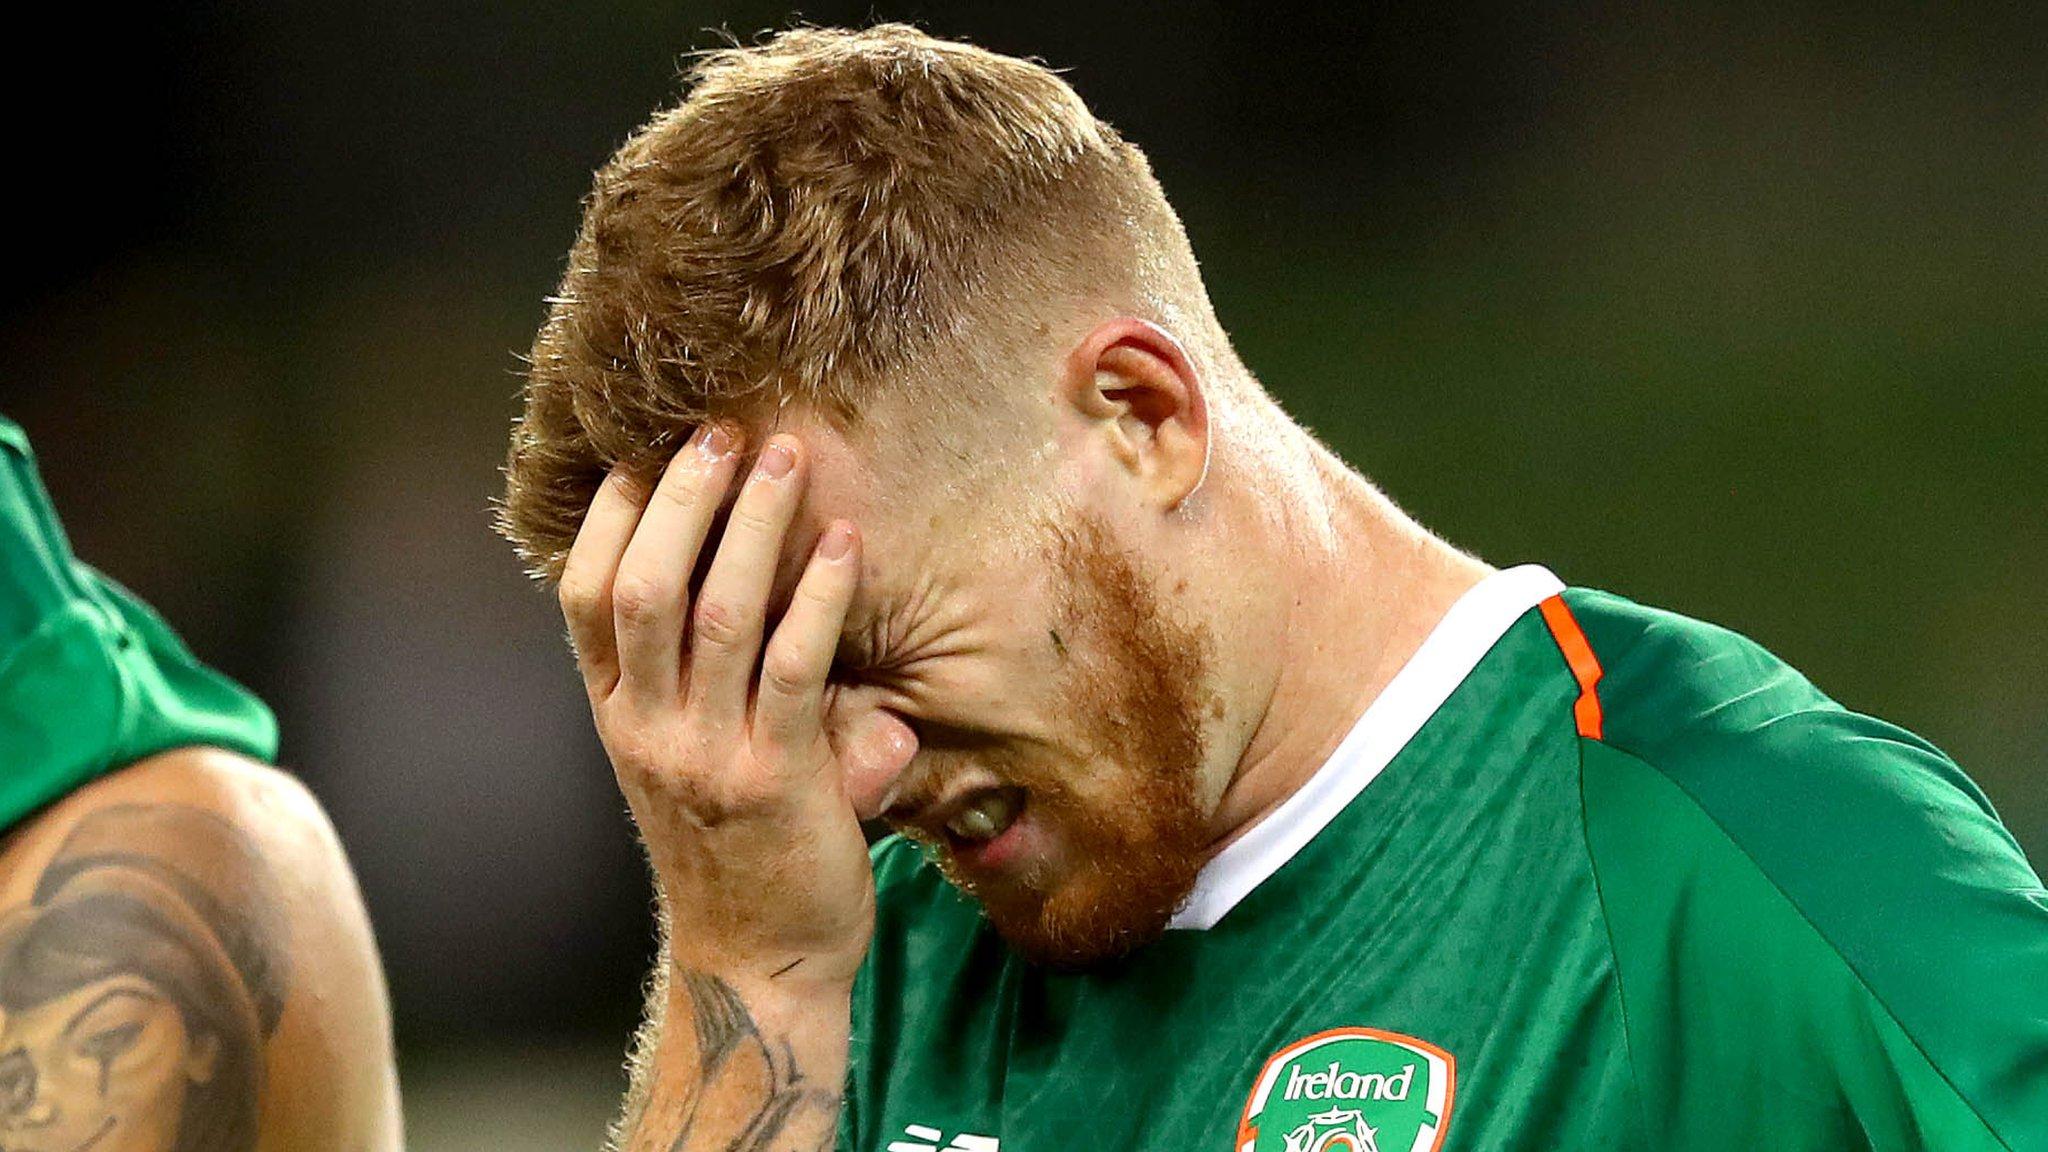 Martin O'Neill sees 'positives' despite latest Republic of Ireland defeat